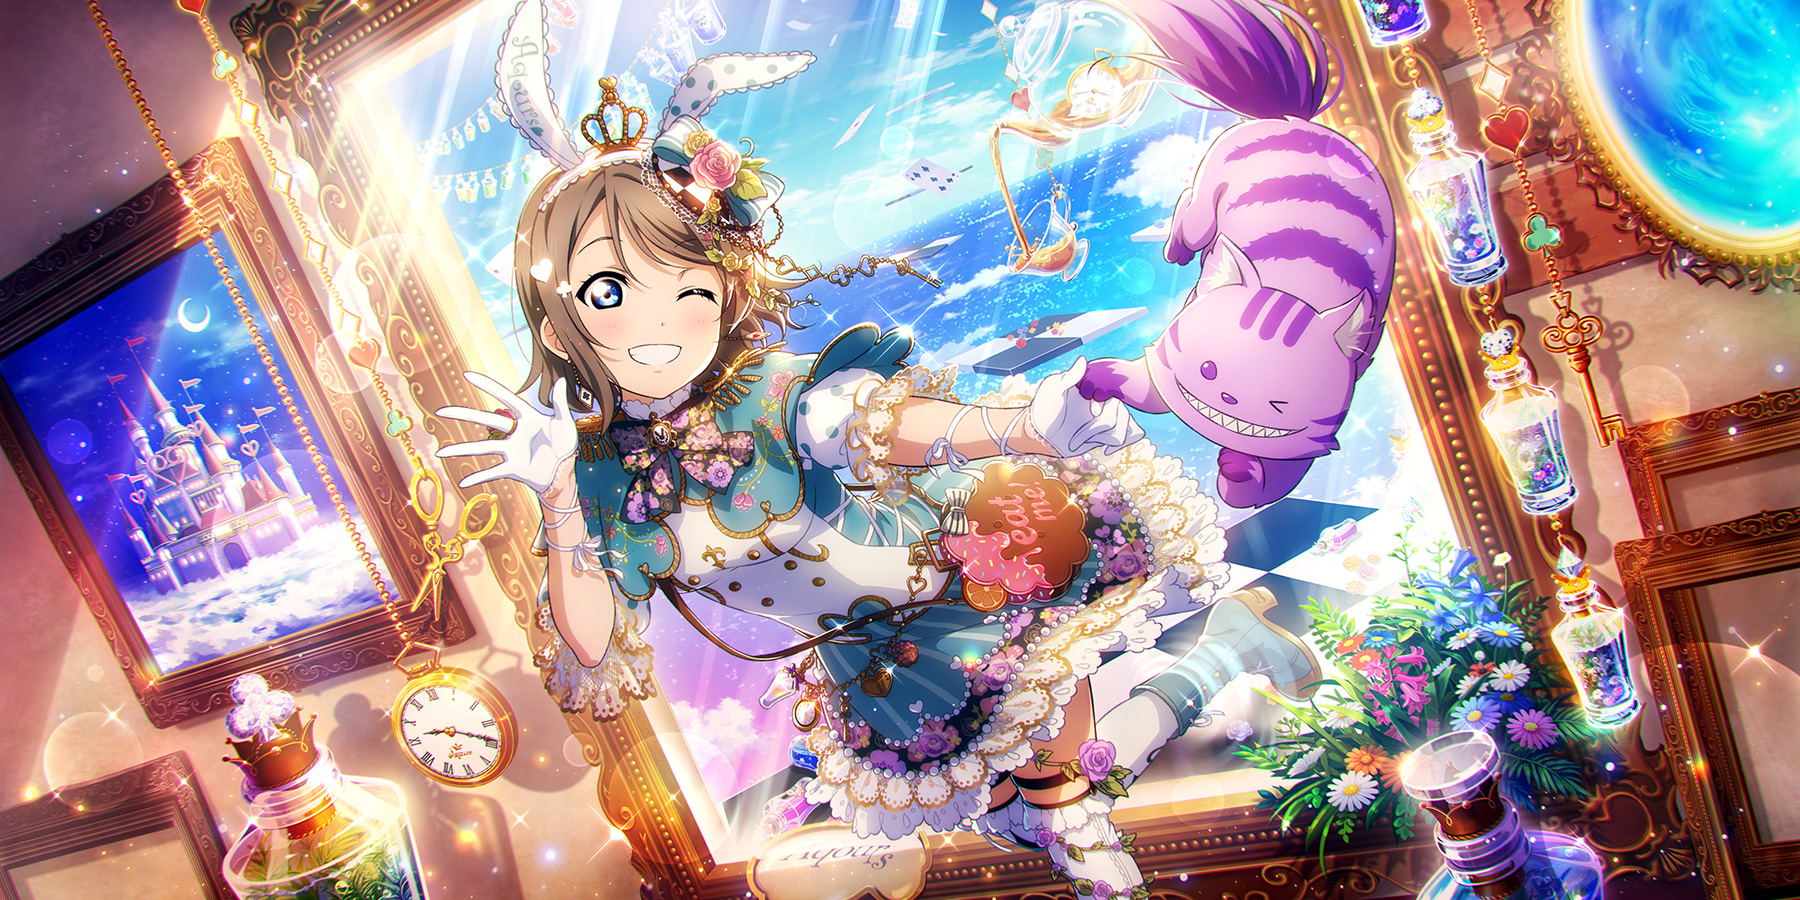 Watanabe You You Watanabe Love Live Sunshine Wallpaper 2707768 Zerochan Anime Image Board